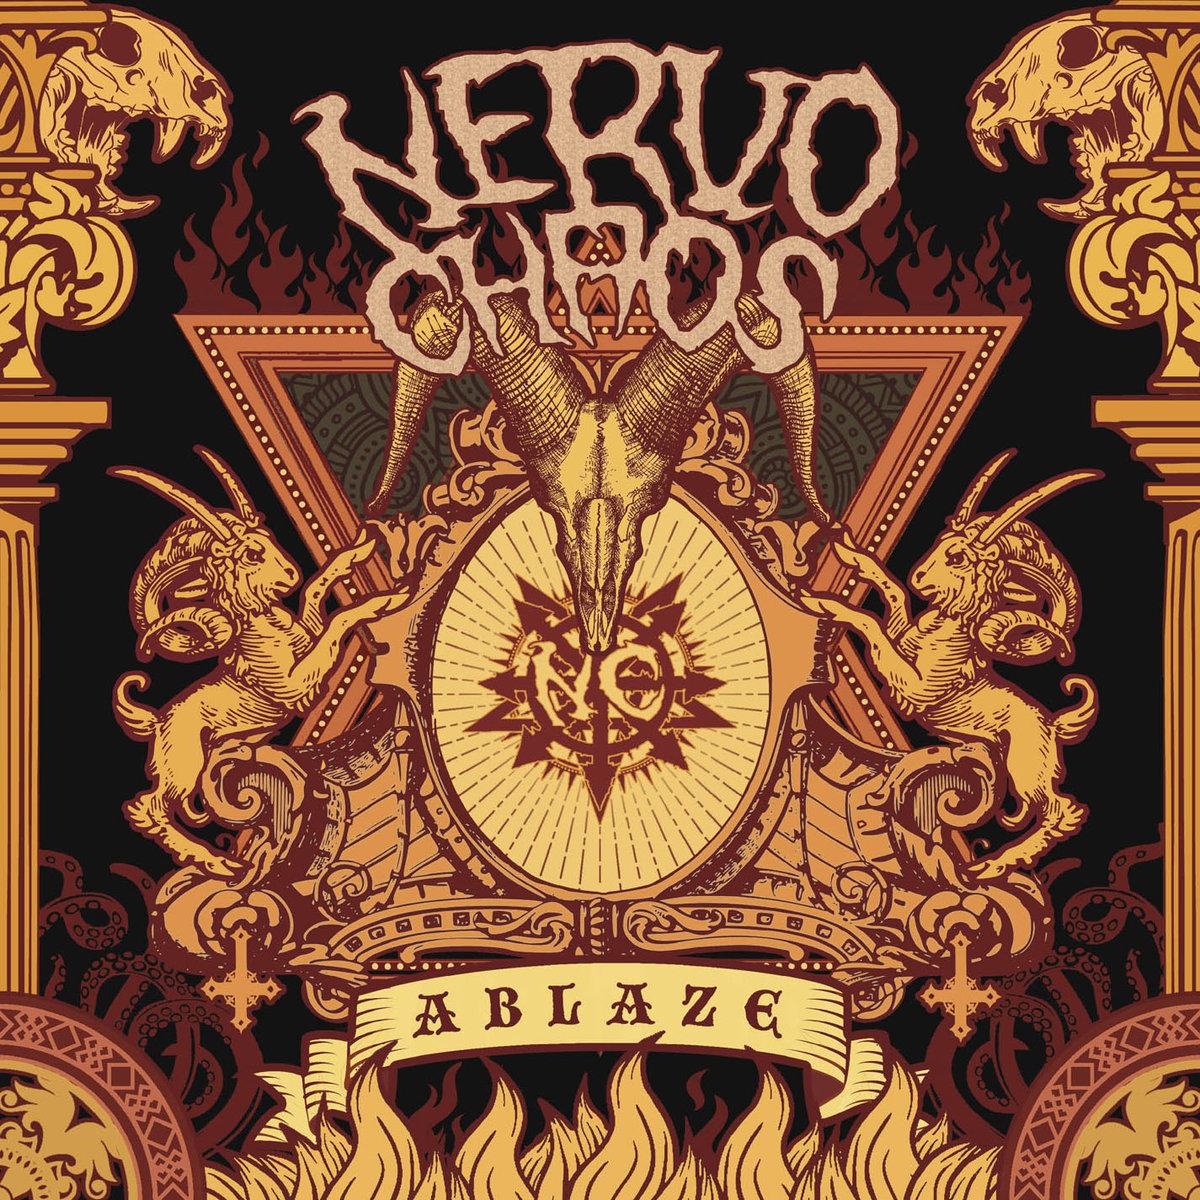 NervoChaos – Ablaze